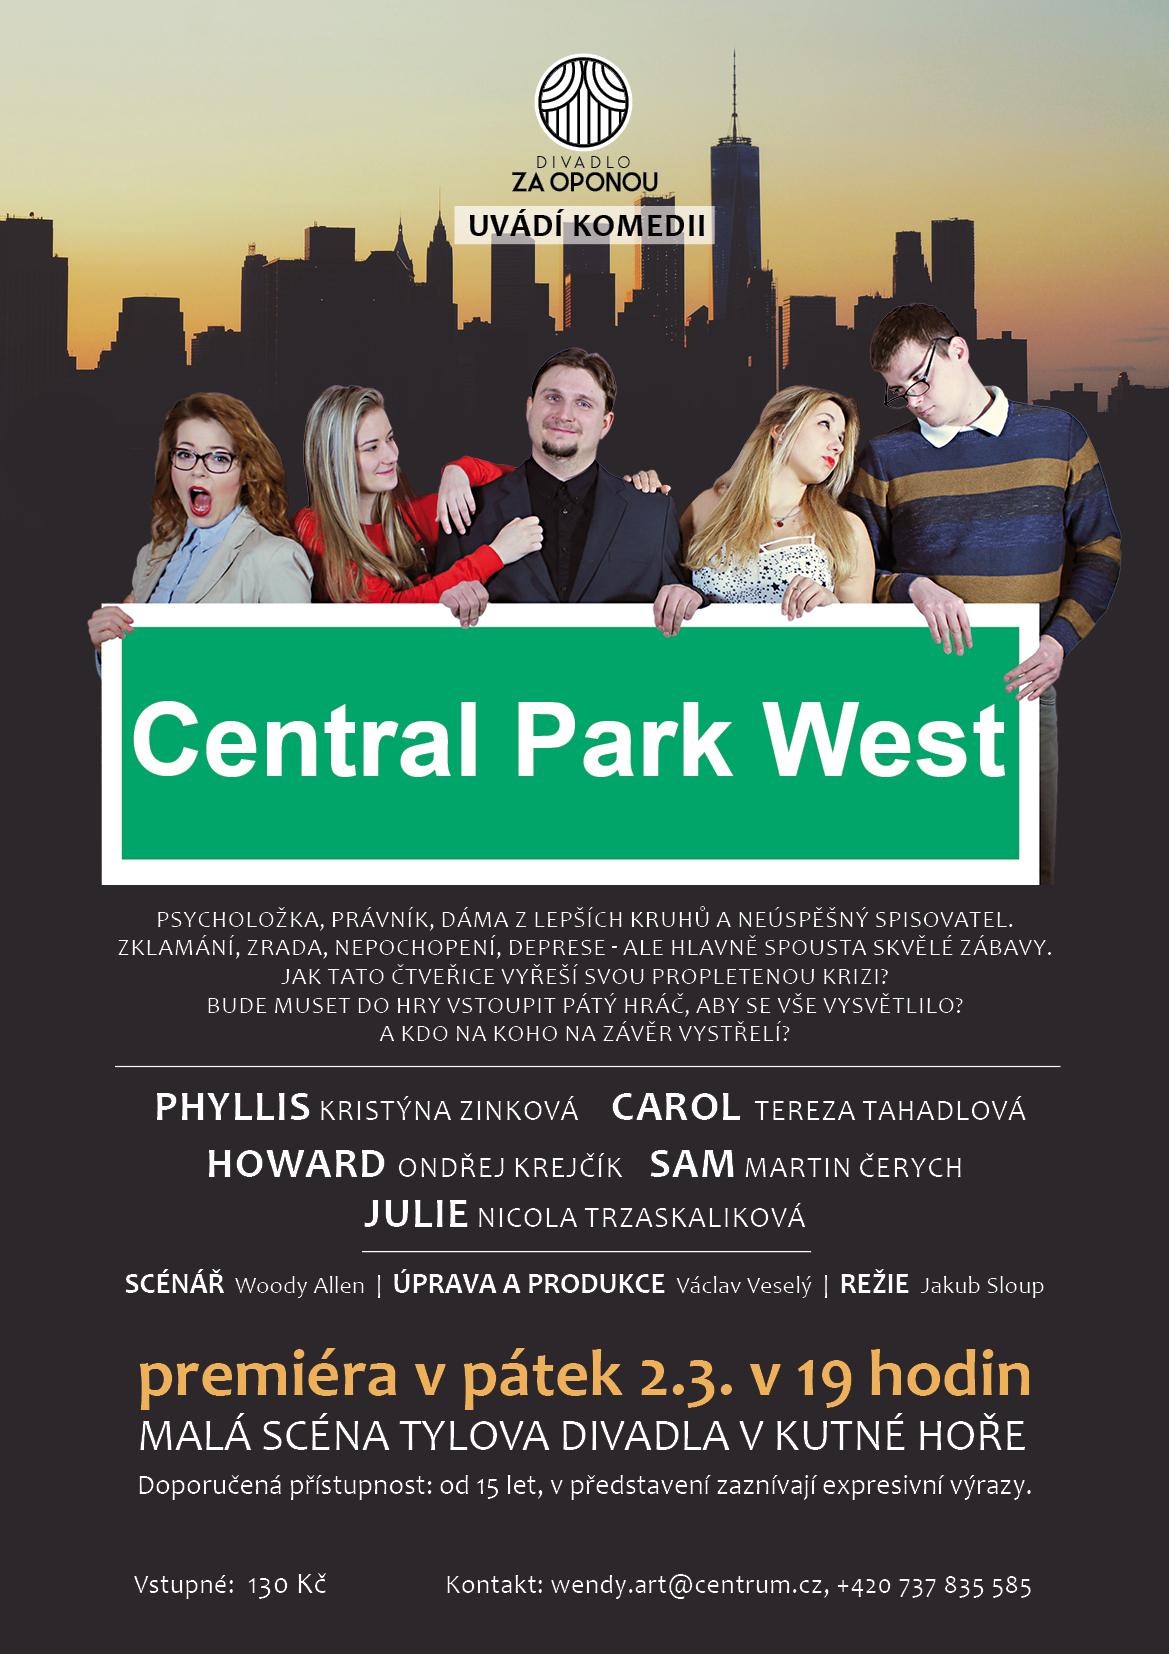 3313-divadlo-za-oponou-plakaa3t-central-park-west-3.jpg